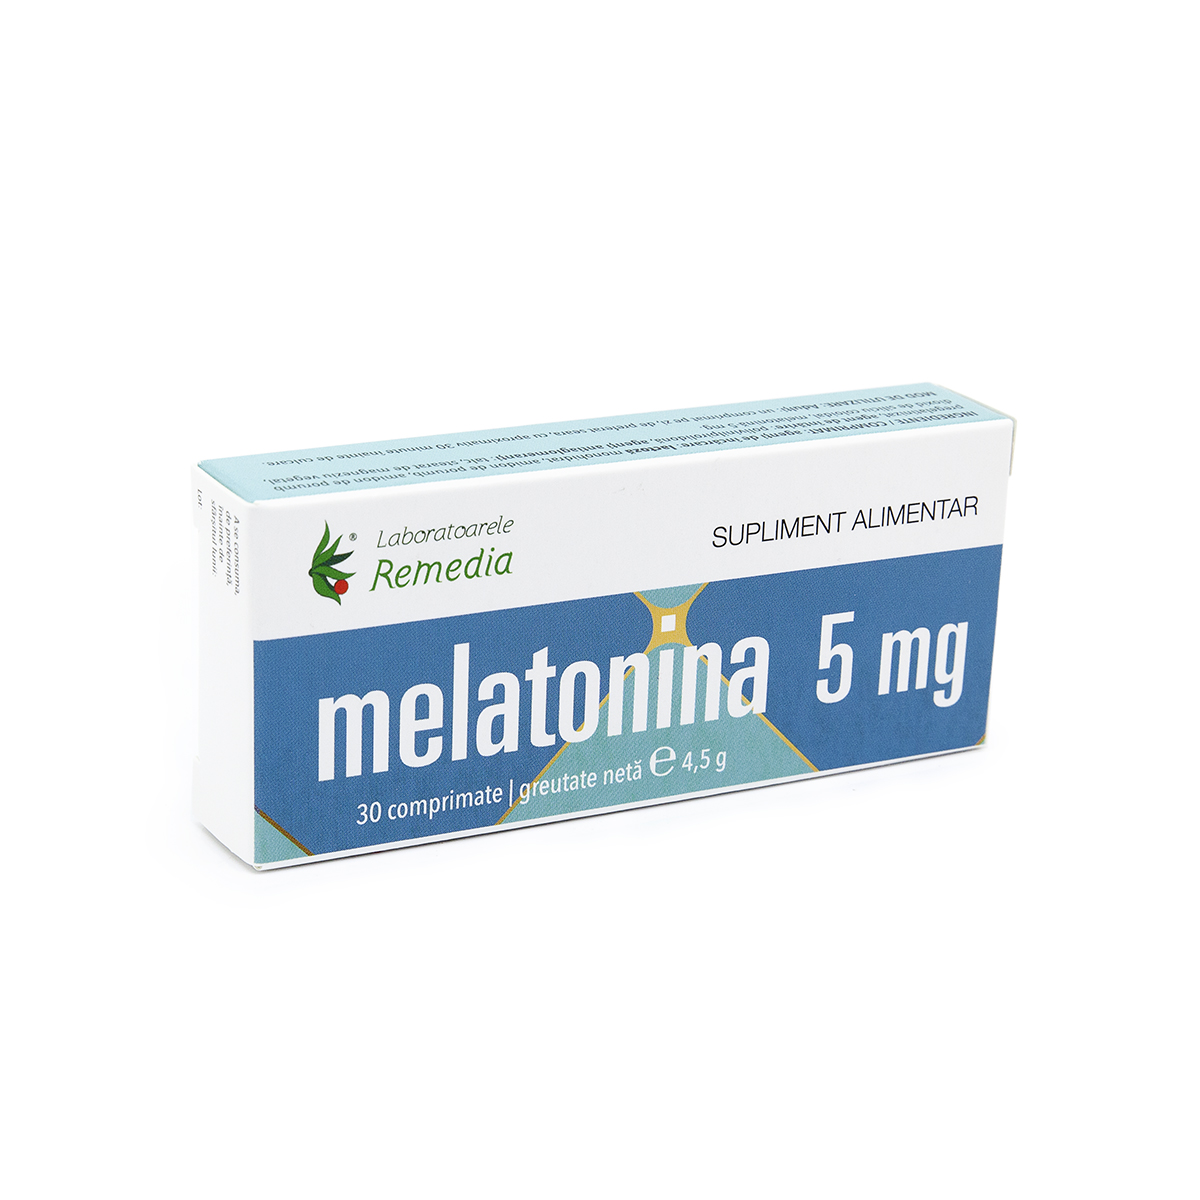 Melatonina 5mg, 30 comprimate, Remedia